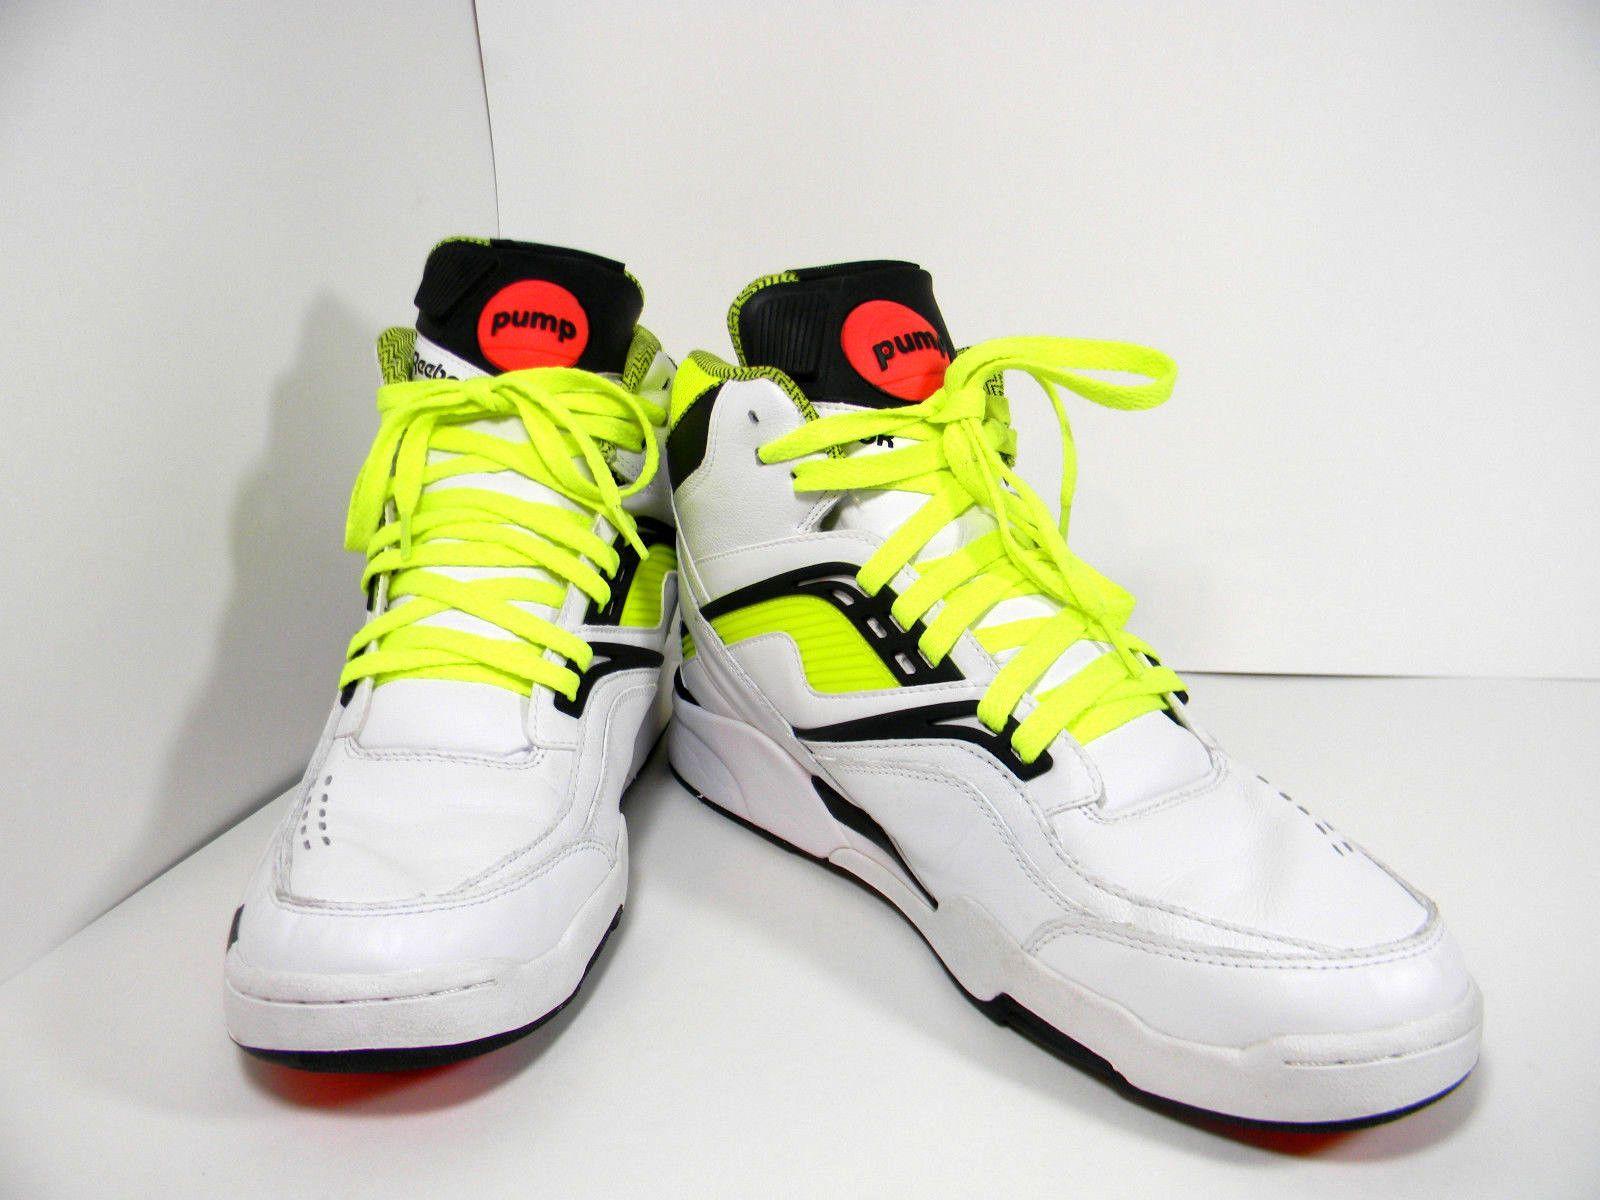 2013 Twilight Zone Reebok The Pump White Neon Yellow Black Shoes Size 11.5 3dd848f6b